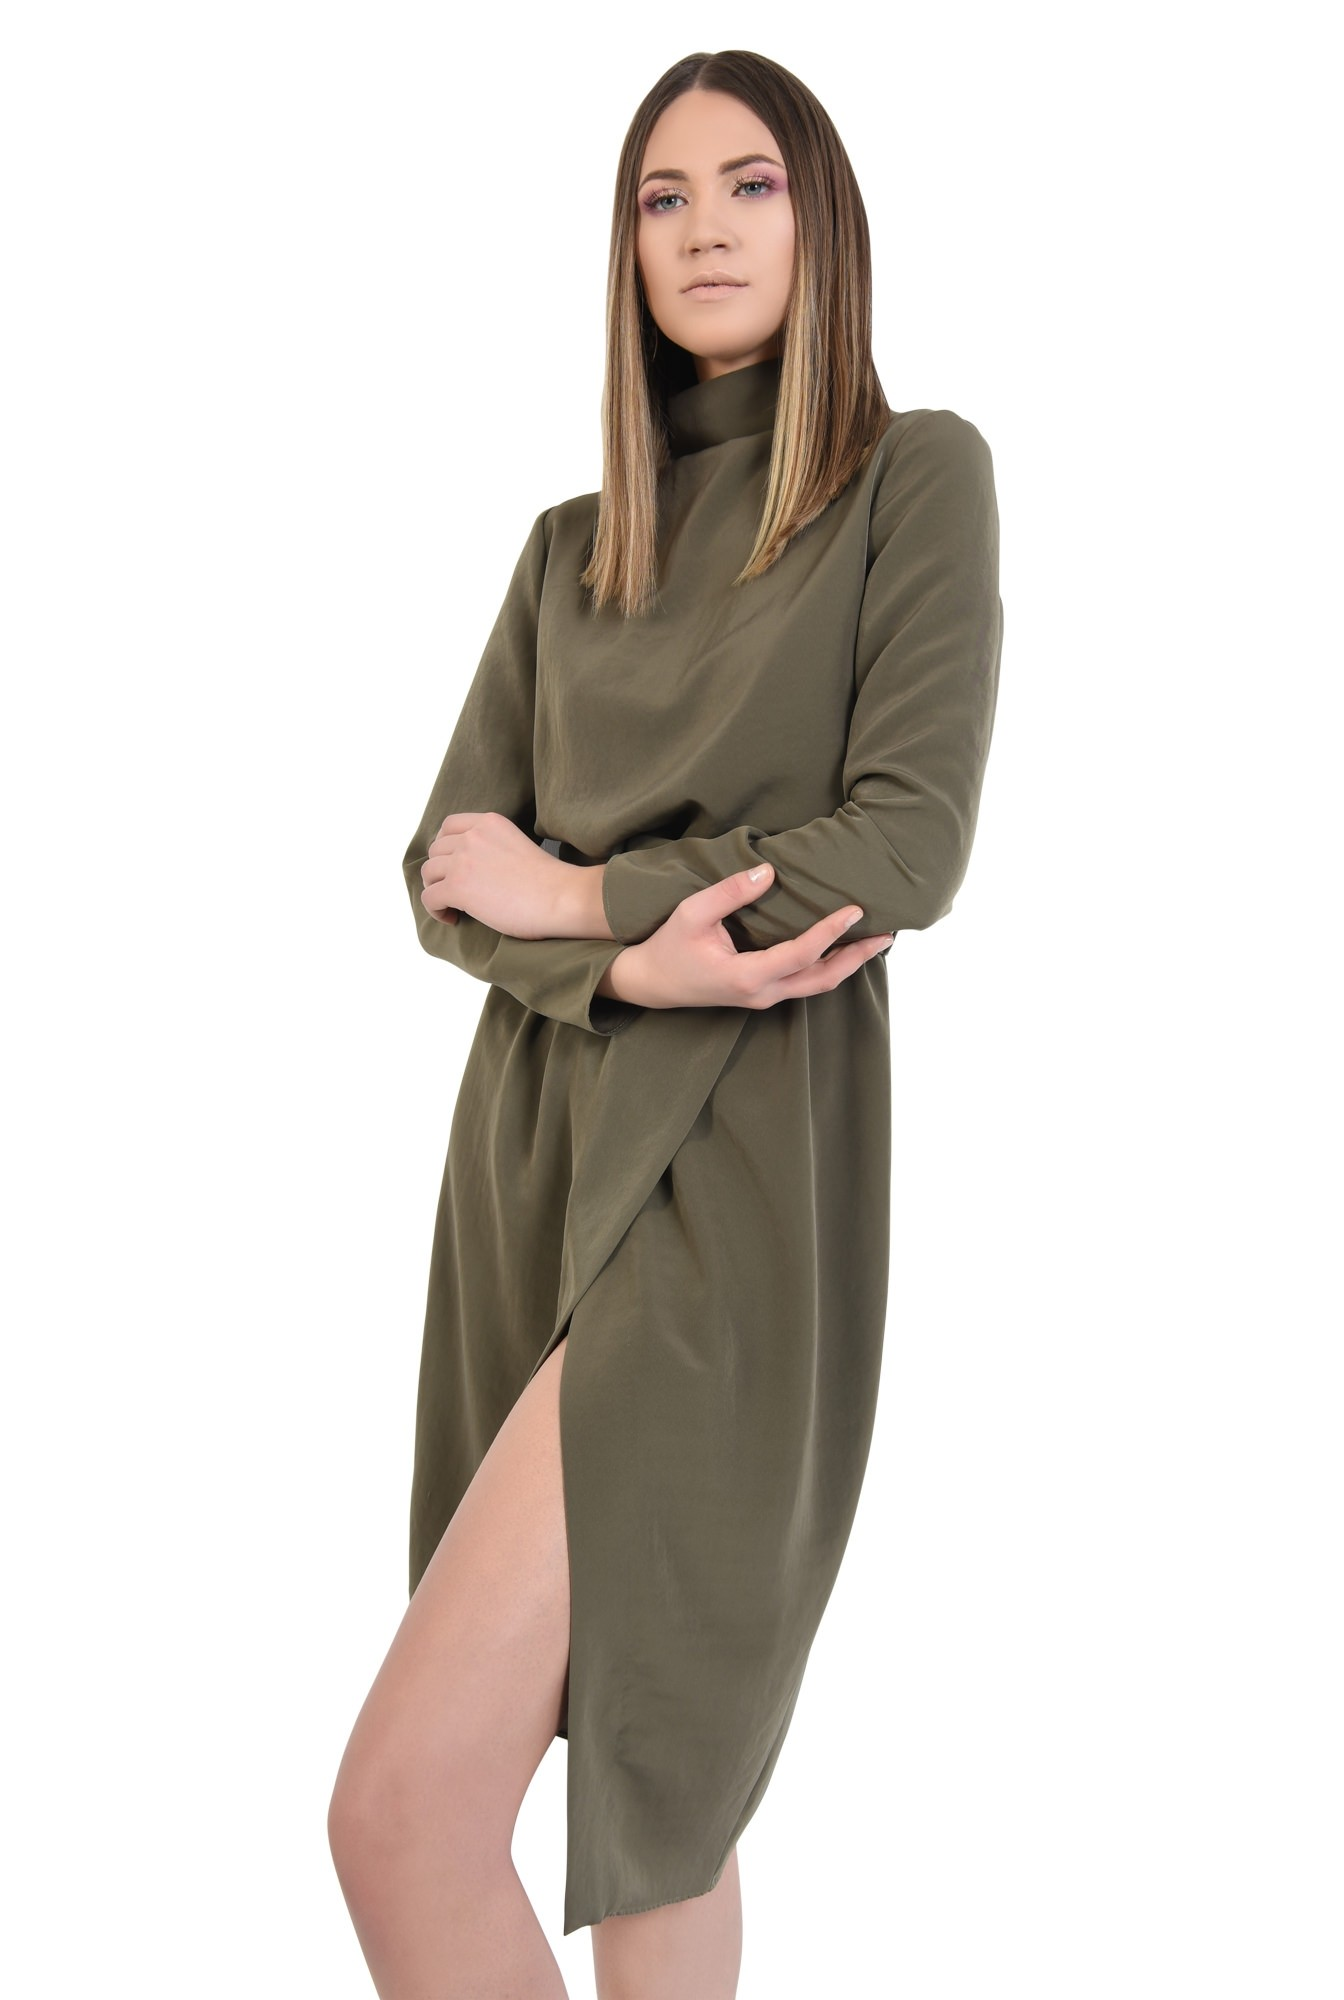 rochie eleganta, de zi, verde, kaki, cu curea, maneci lungi